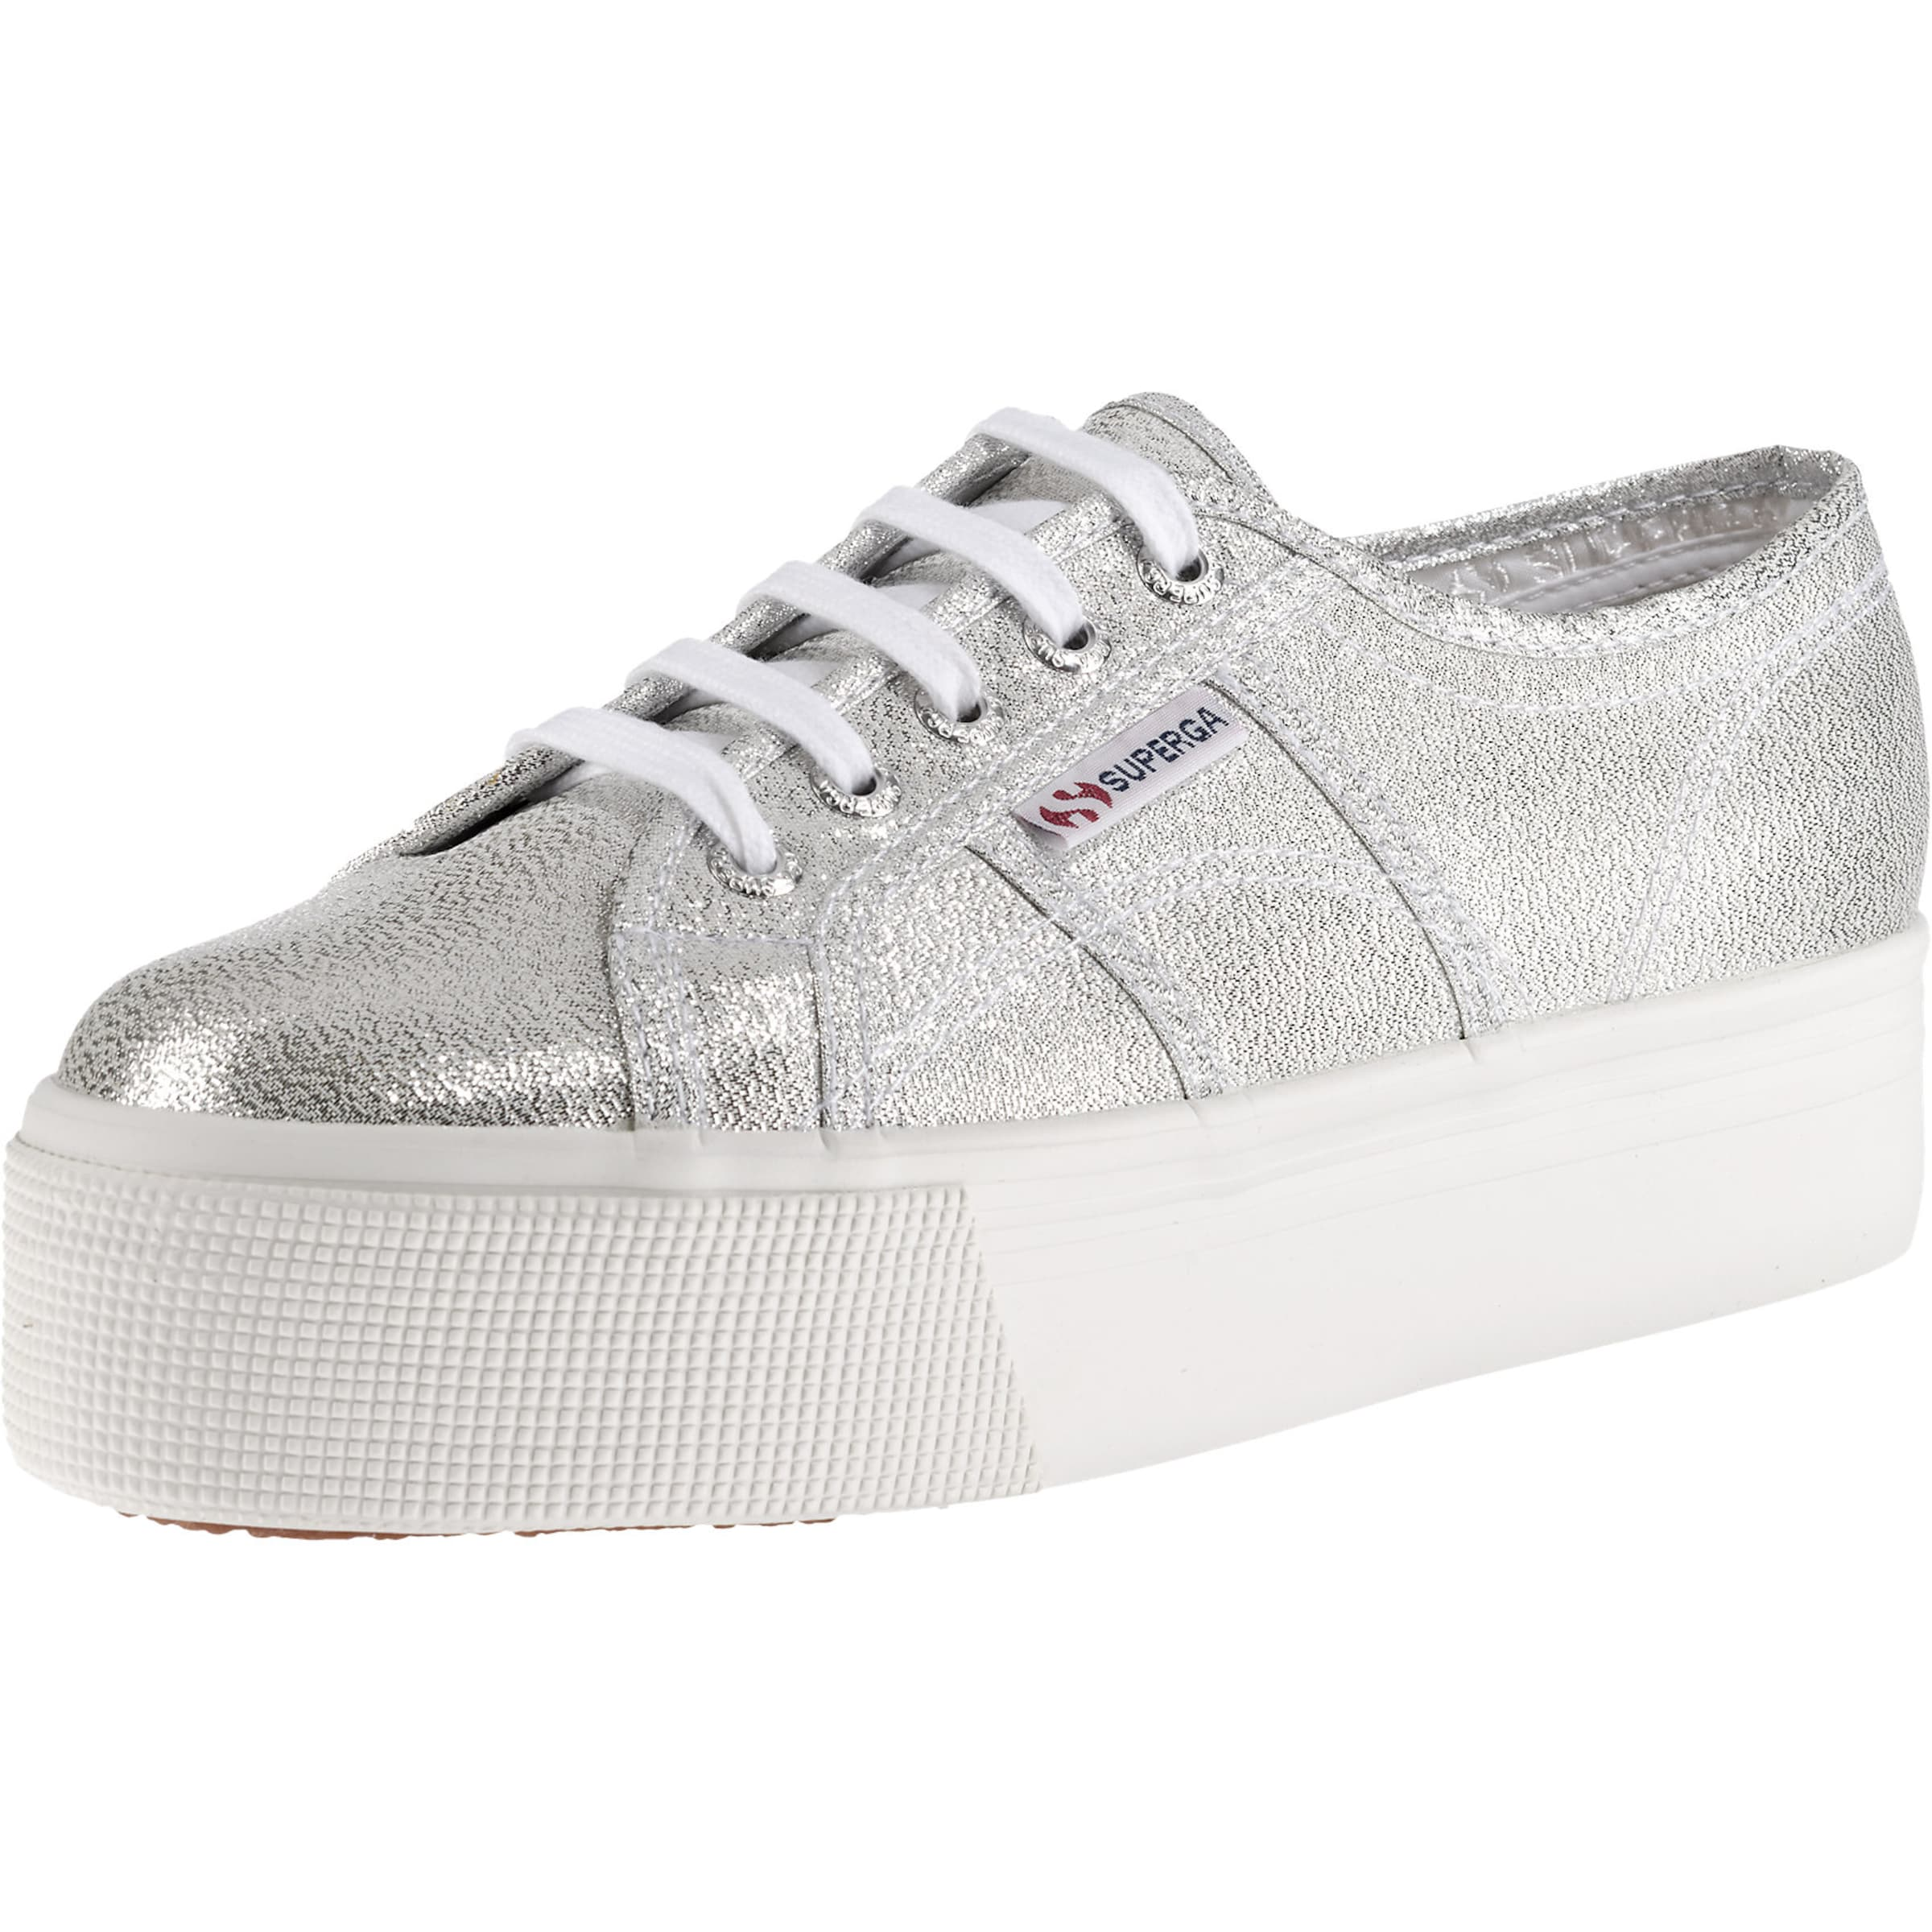 SUPERGA Sneaker 2790 Lamew Verschleißfeste billige Schuhe